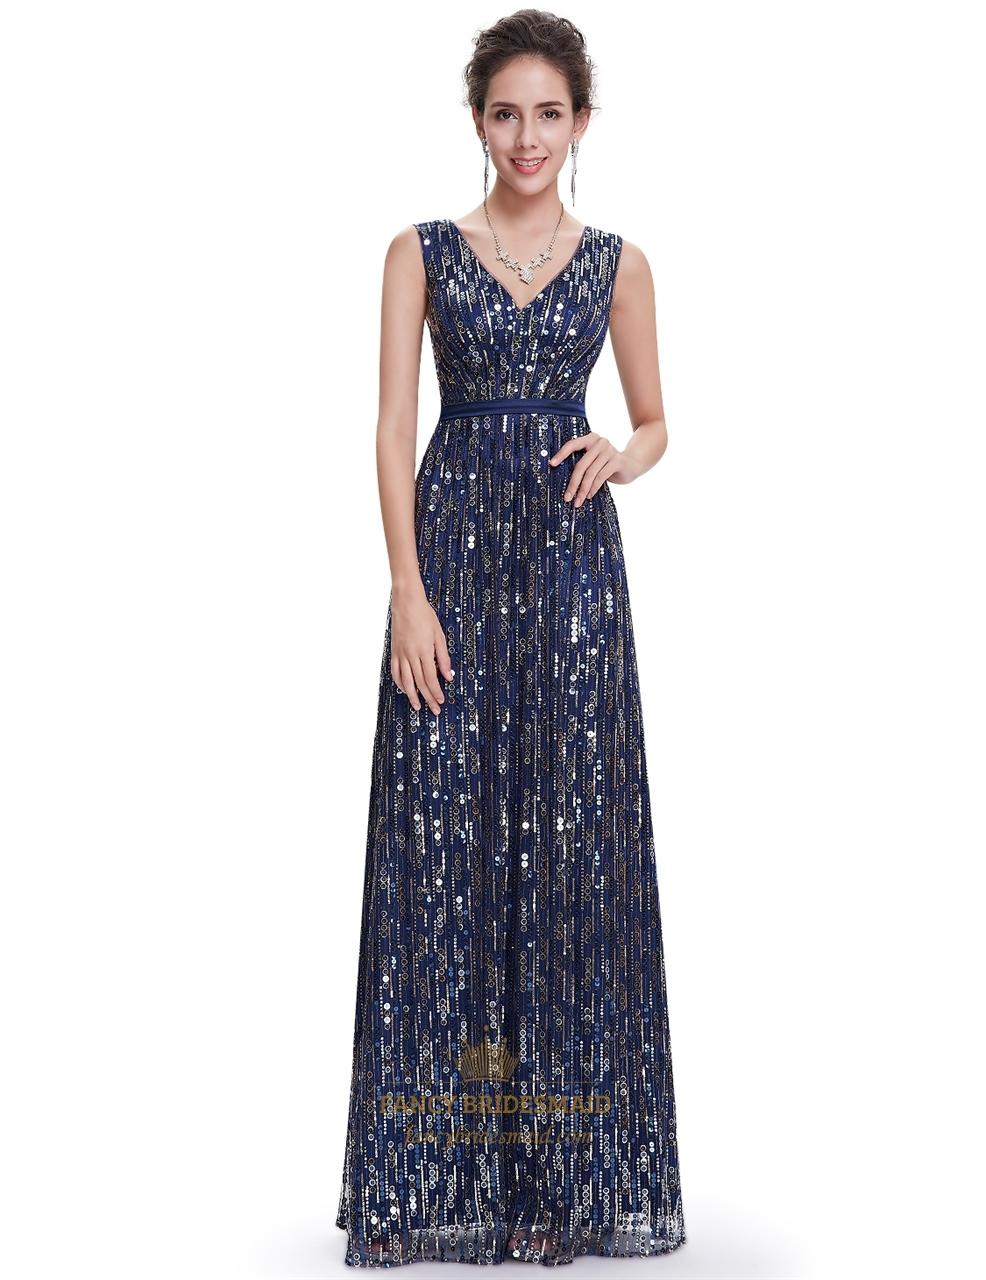 a1c827b6 Elegant Navy Blue Floor Length Contrast V-Neck Sequin Prom Dress SKU -NW1514